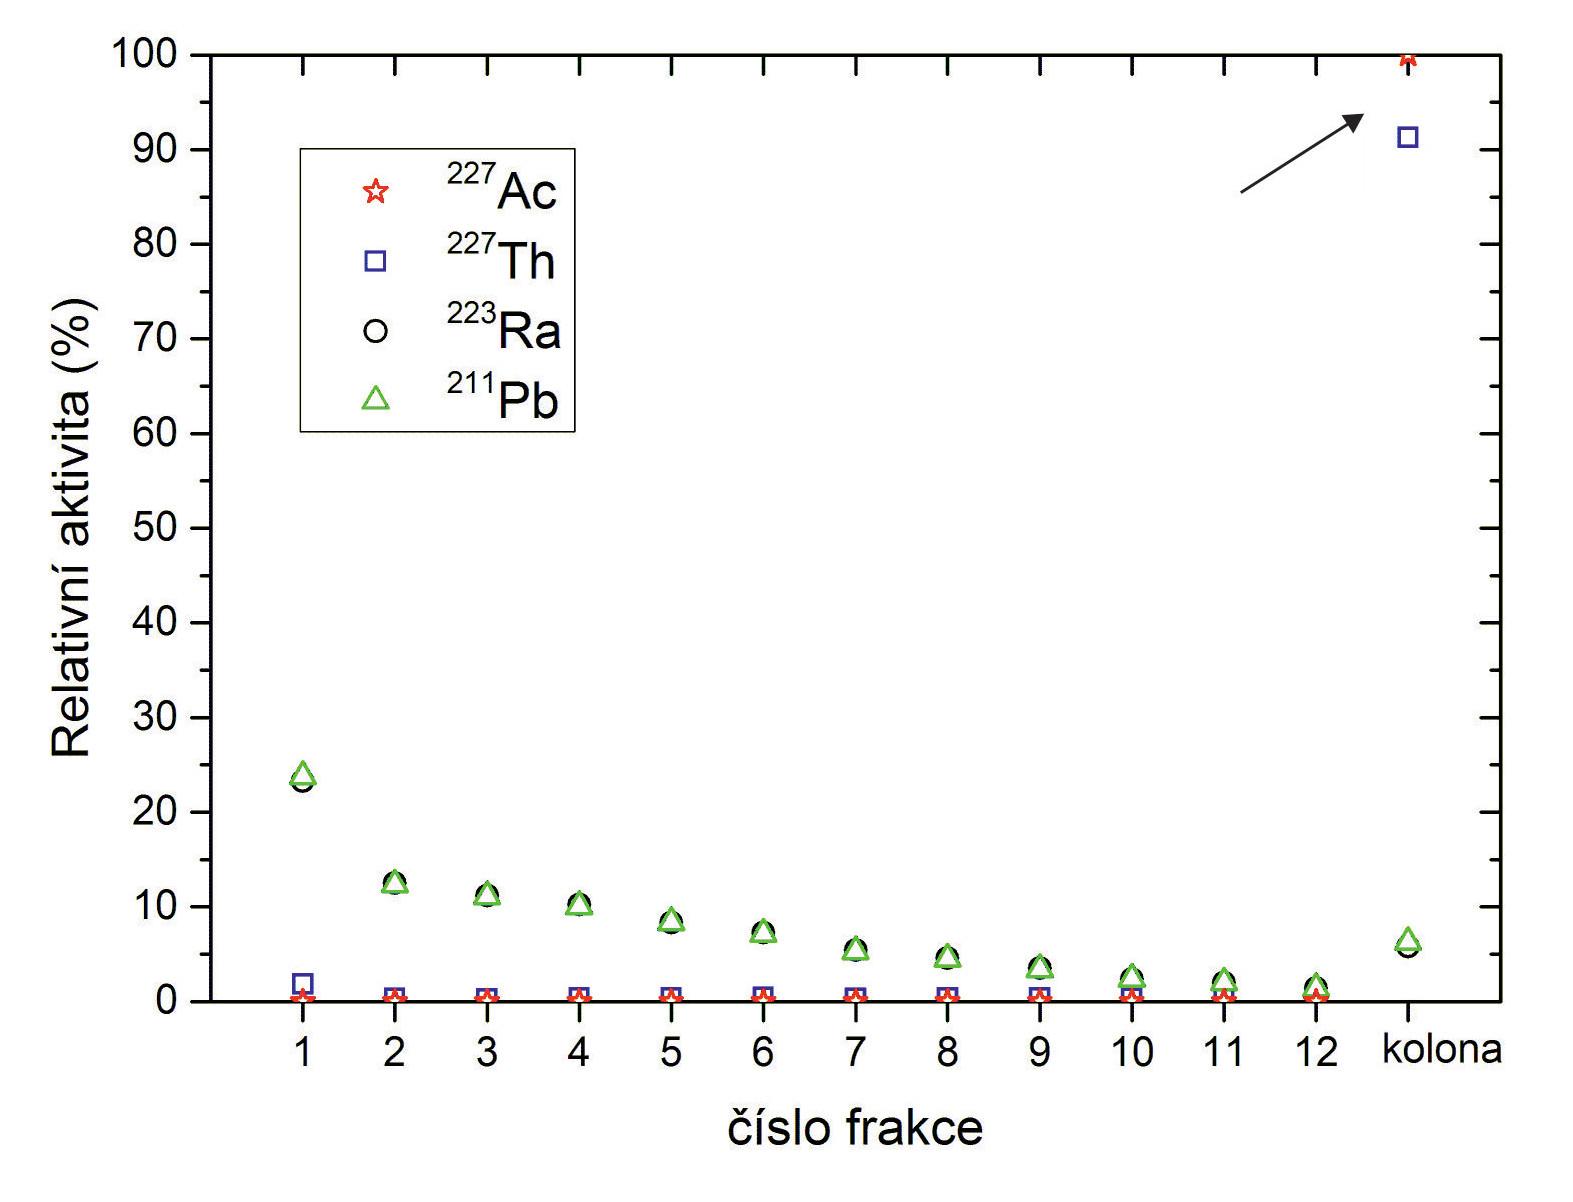 Eluční profil <sup>227</sup>Ac, <sup>227</sup>Th, <sup>223</sup>Ra a <sup>211</sup>Pb v prostředí 0,7M HNO<sub>3</sub> v 80% MeOH s NaCl.